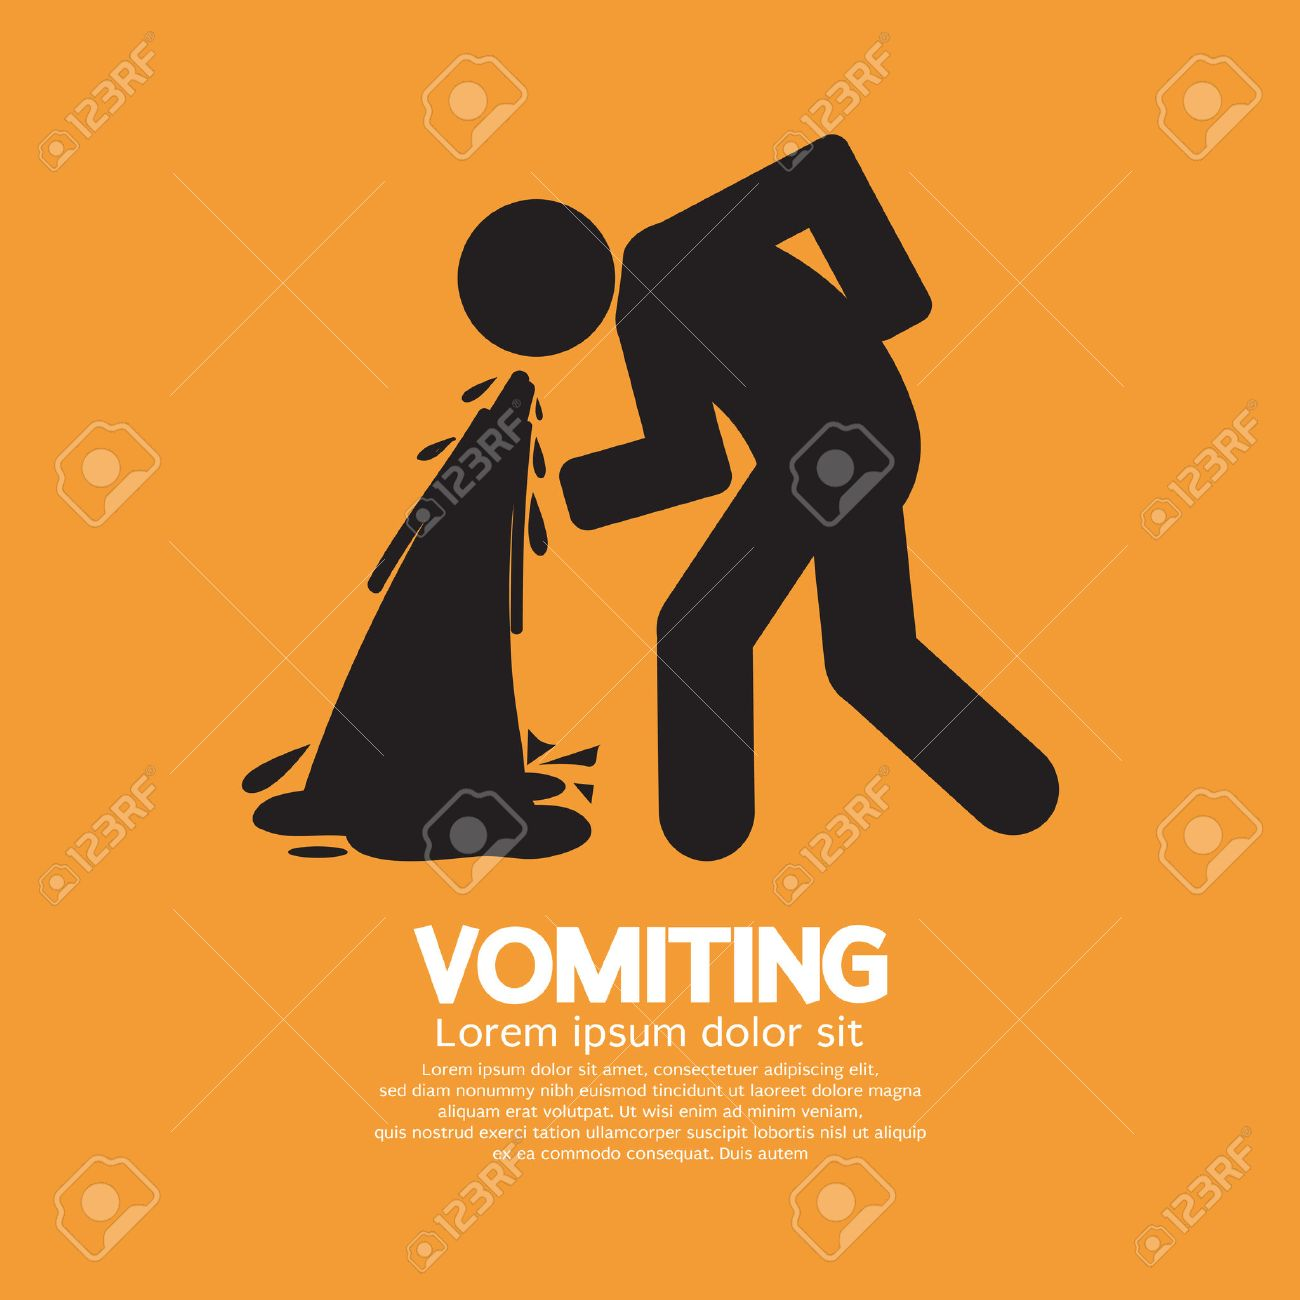 Vomiting Person Graphic Symbol Vector Illustration - 30930046